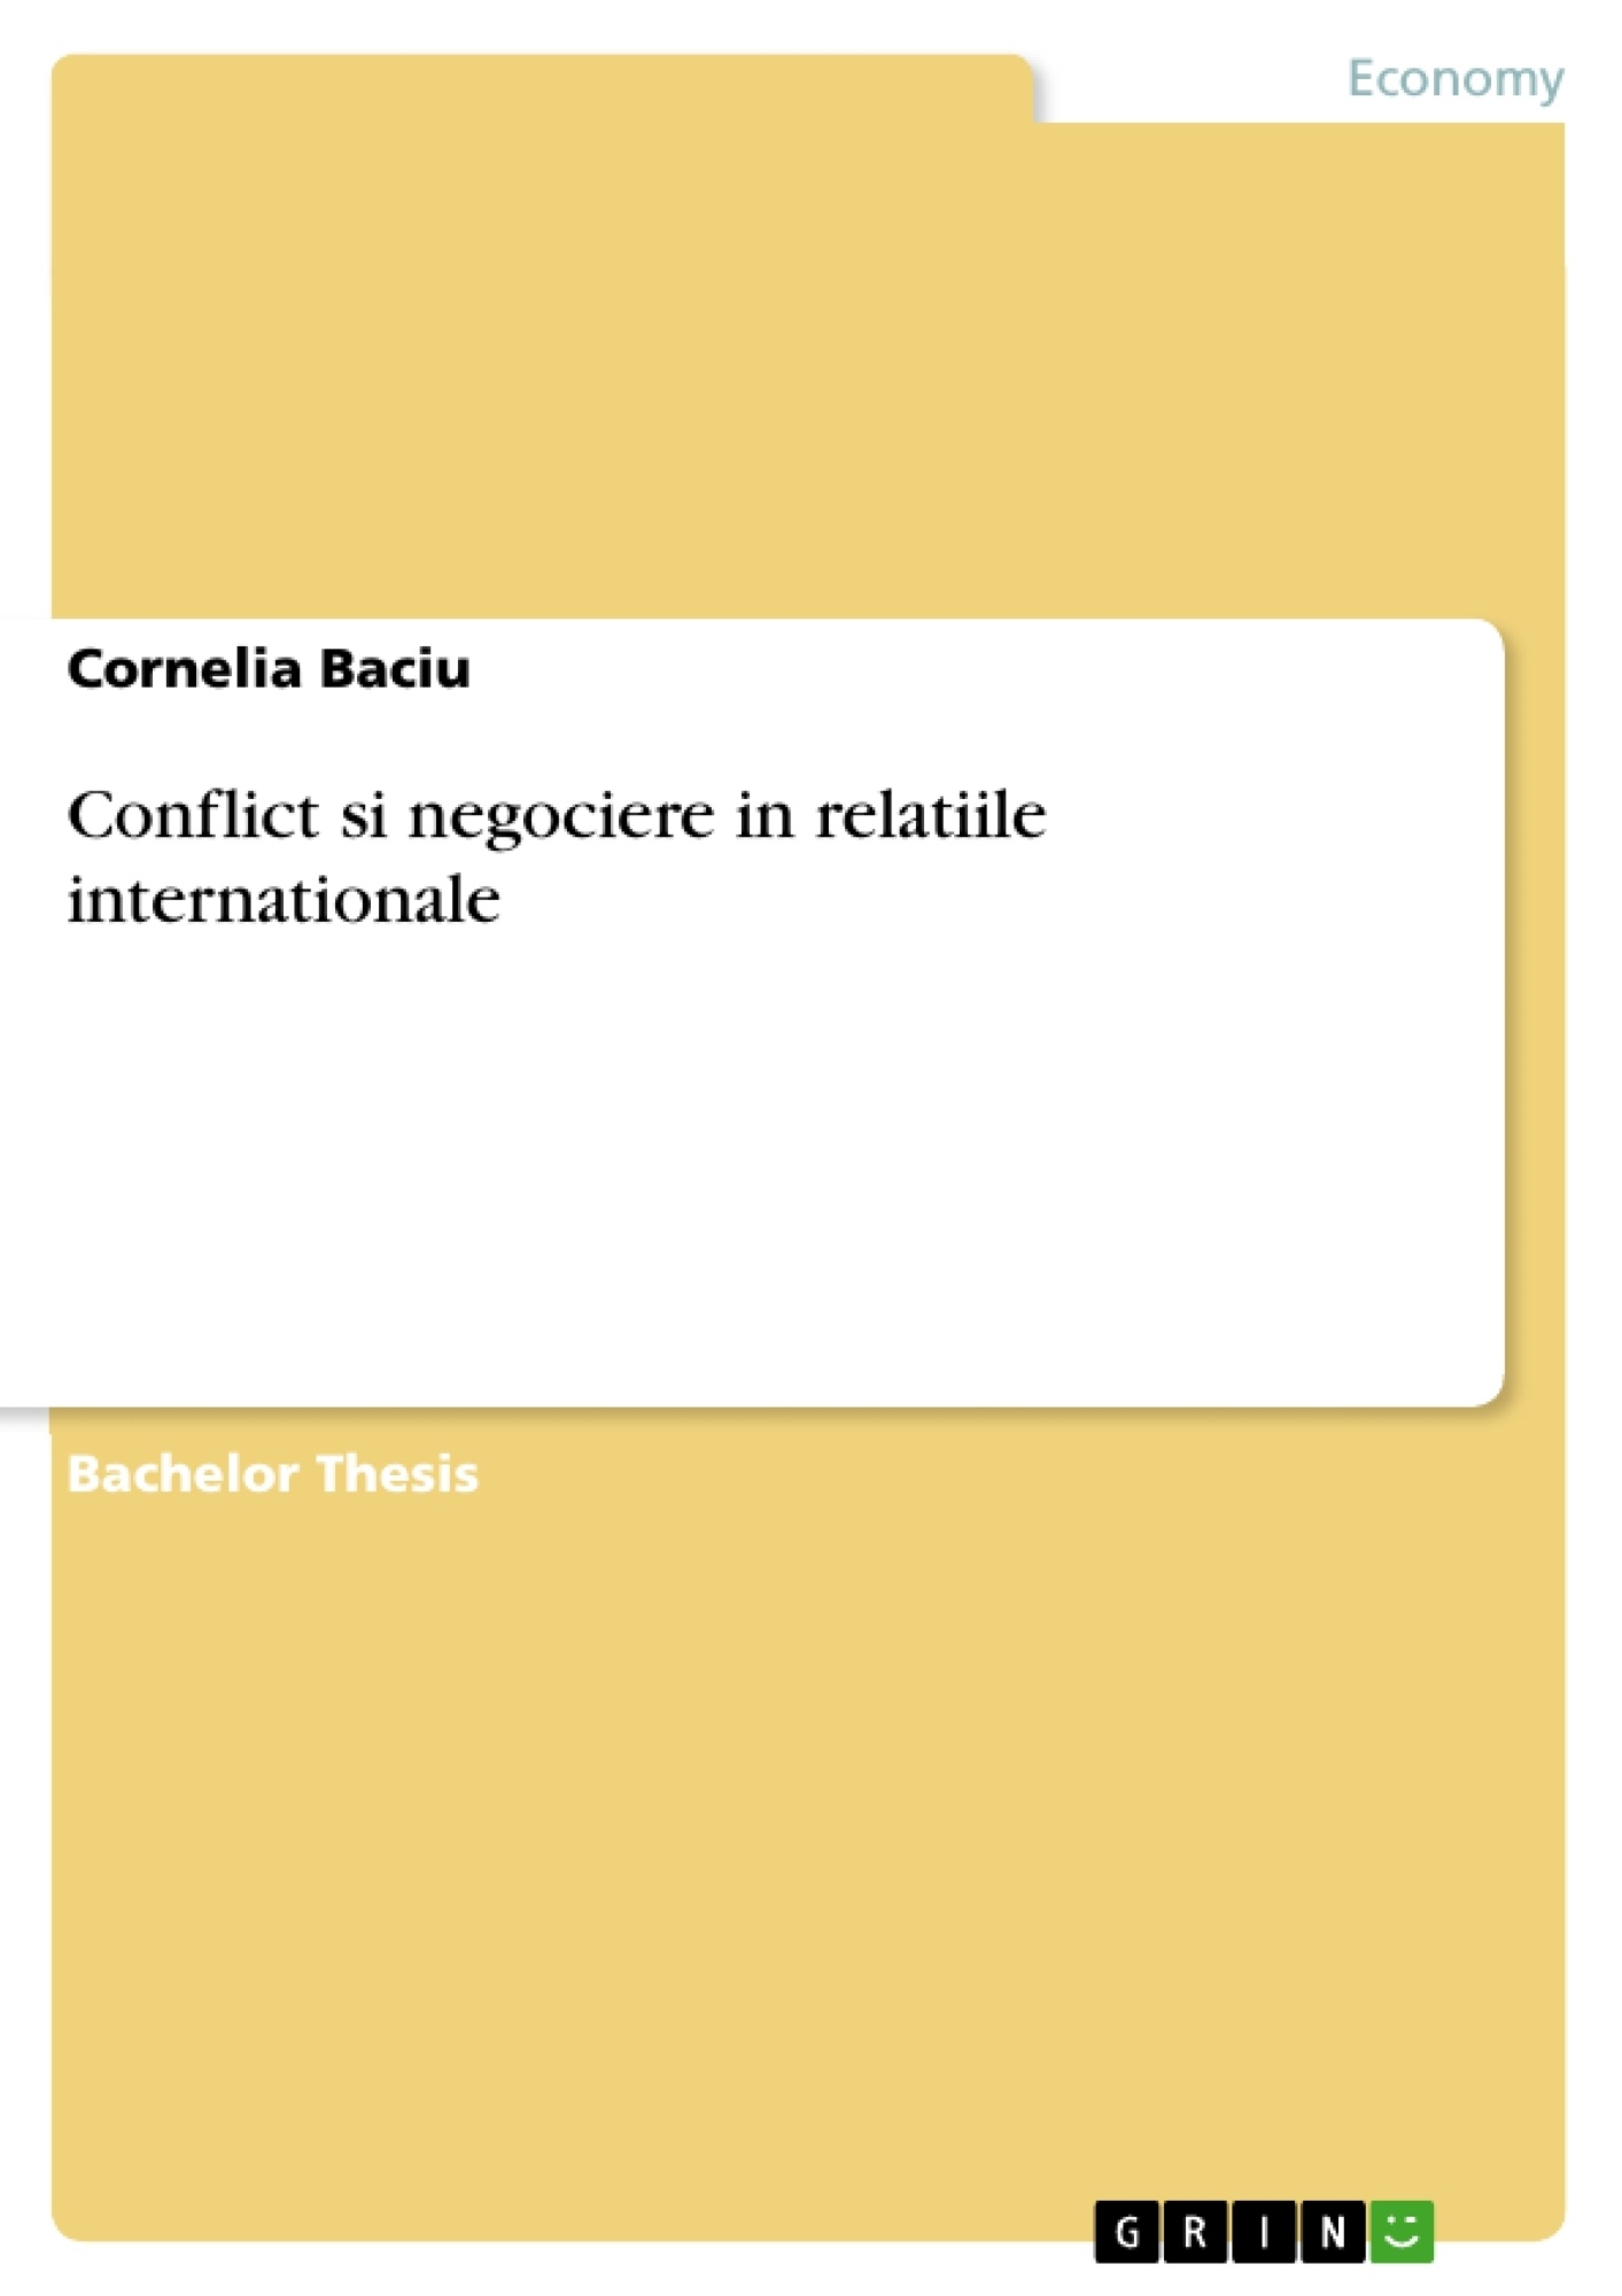 Title: Conflict si negociere in relatiile internationale